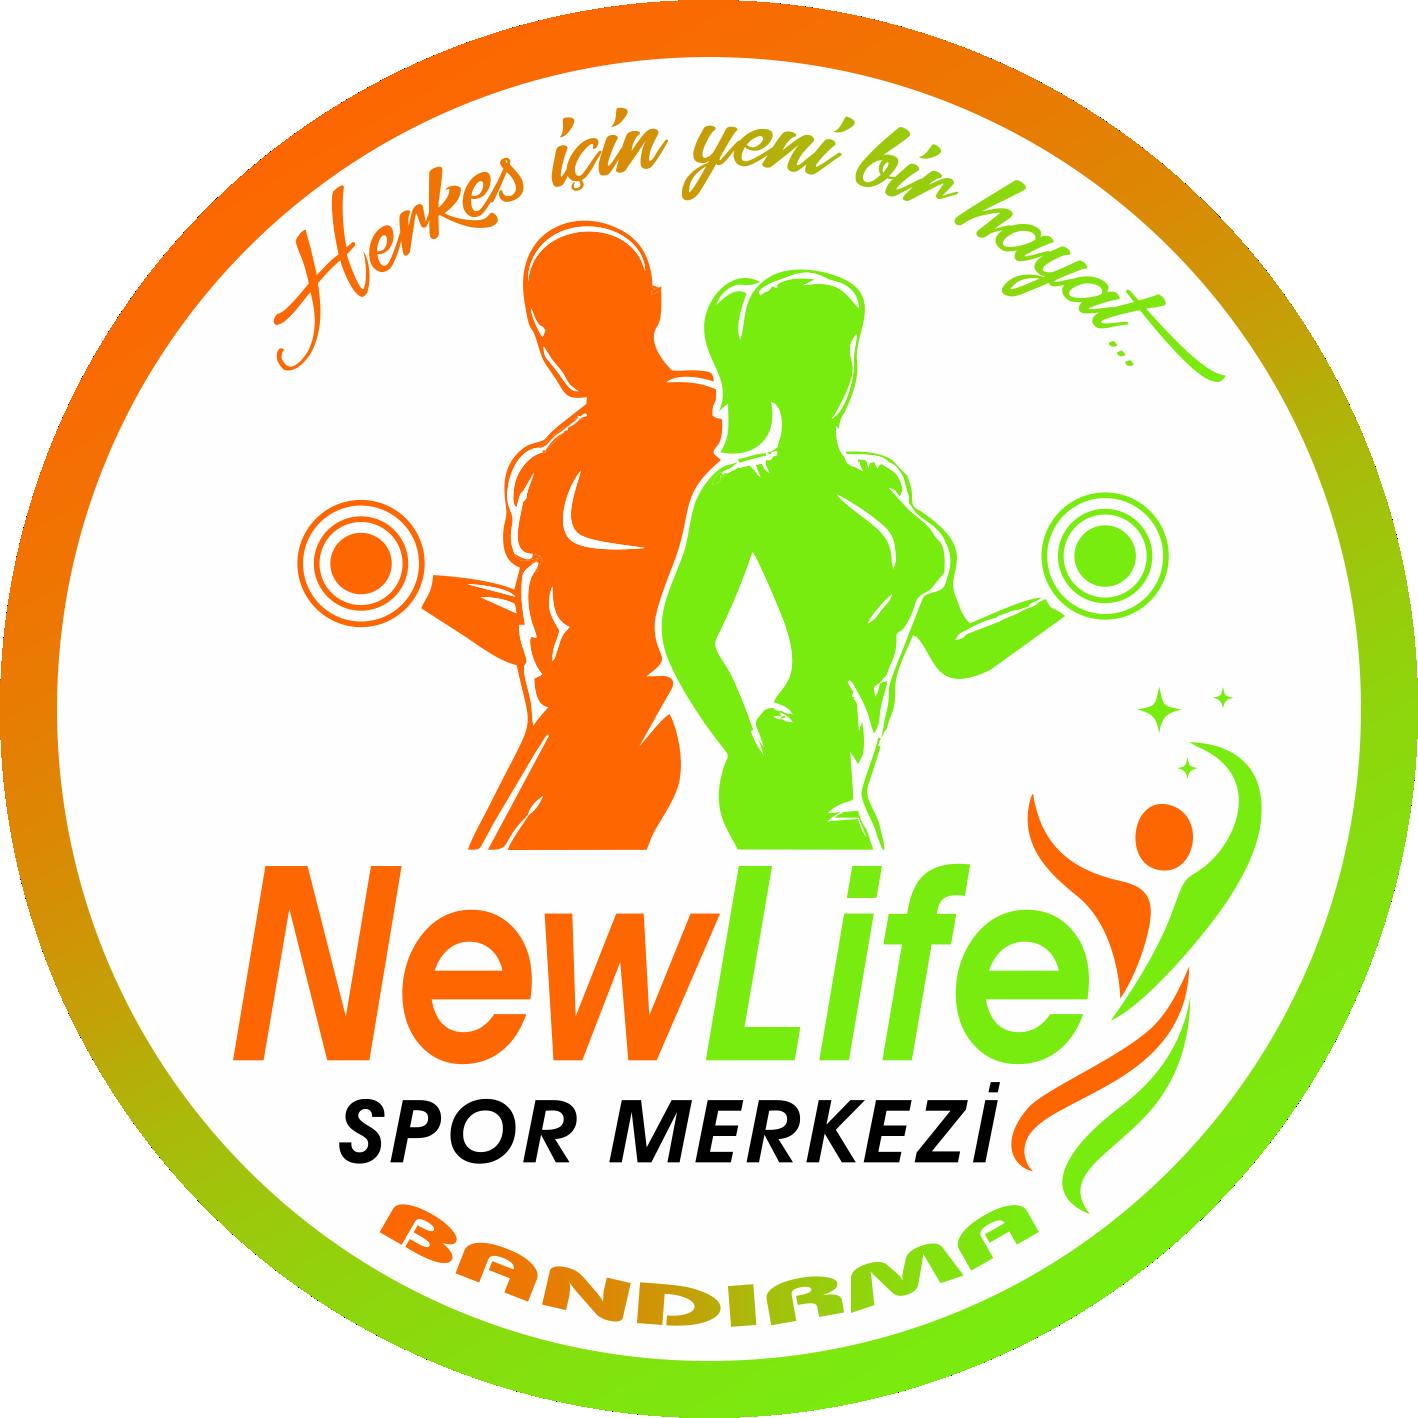 New Life Spor Merkezi